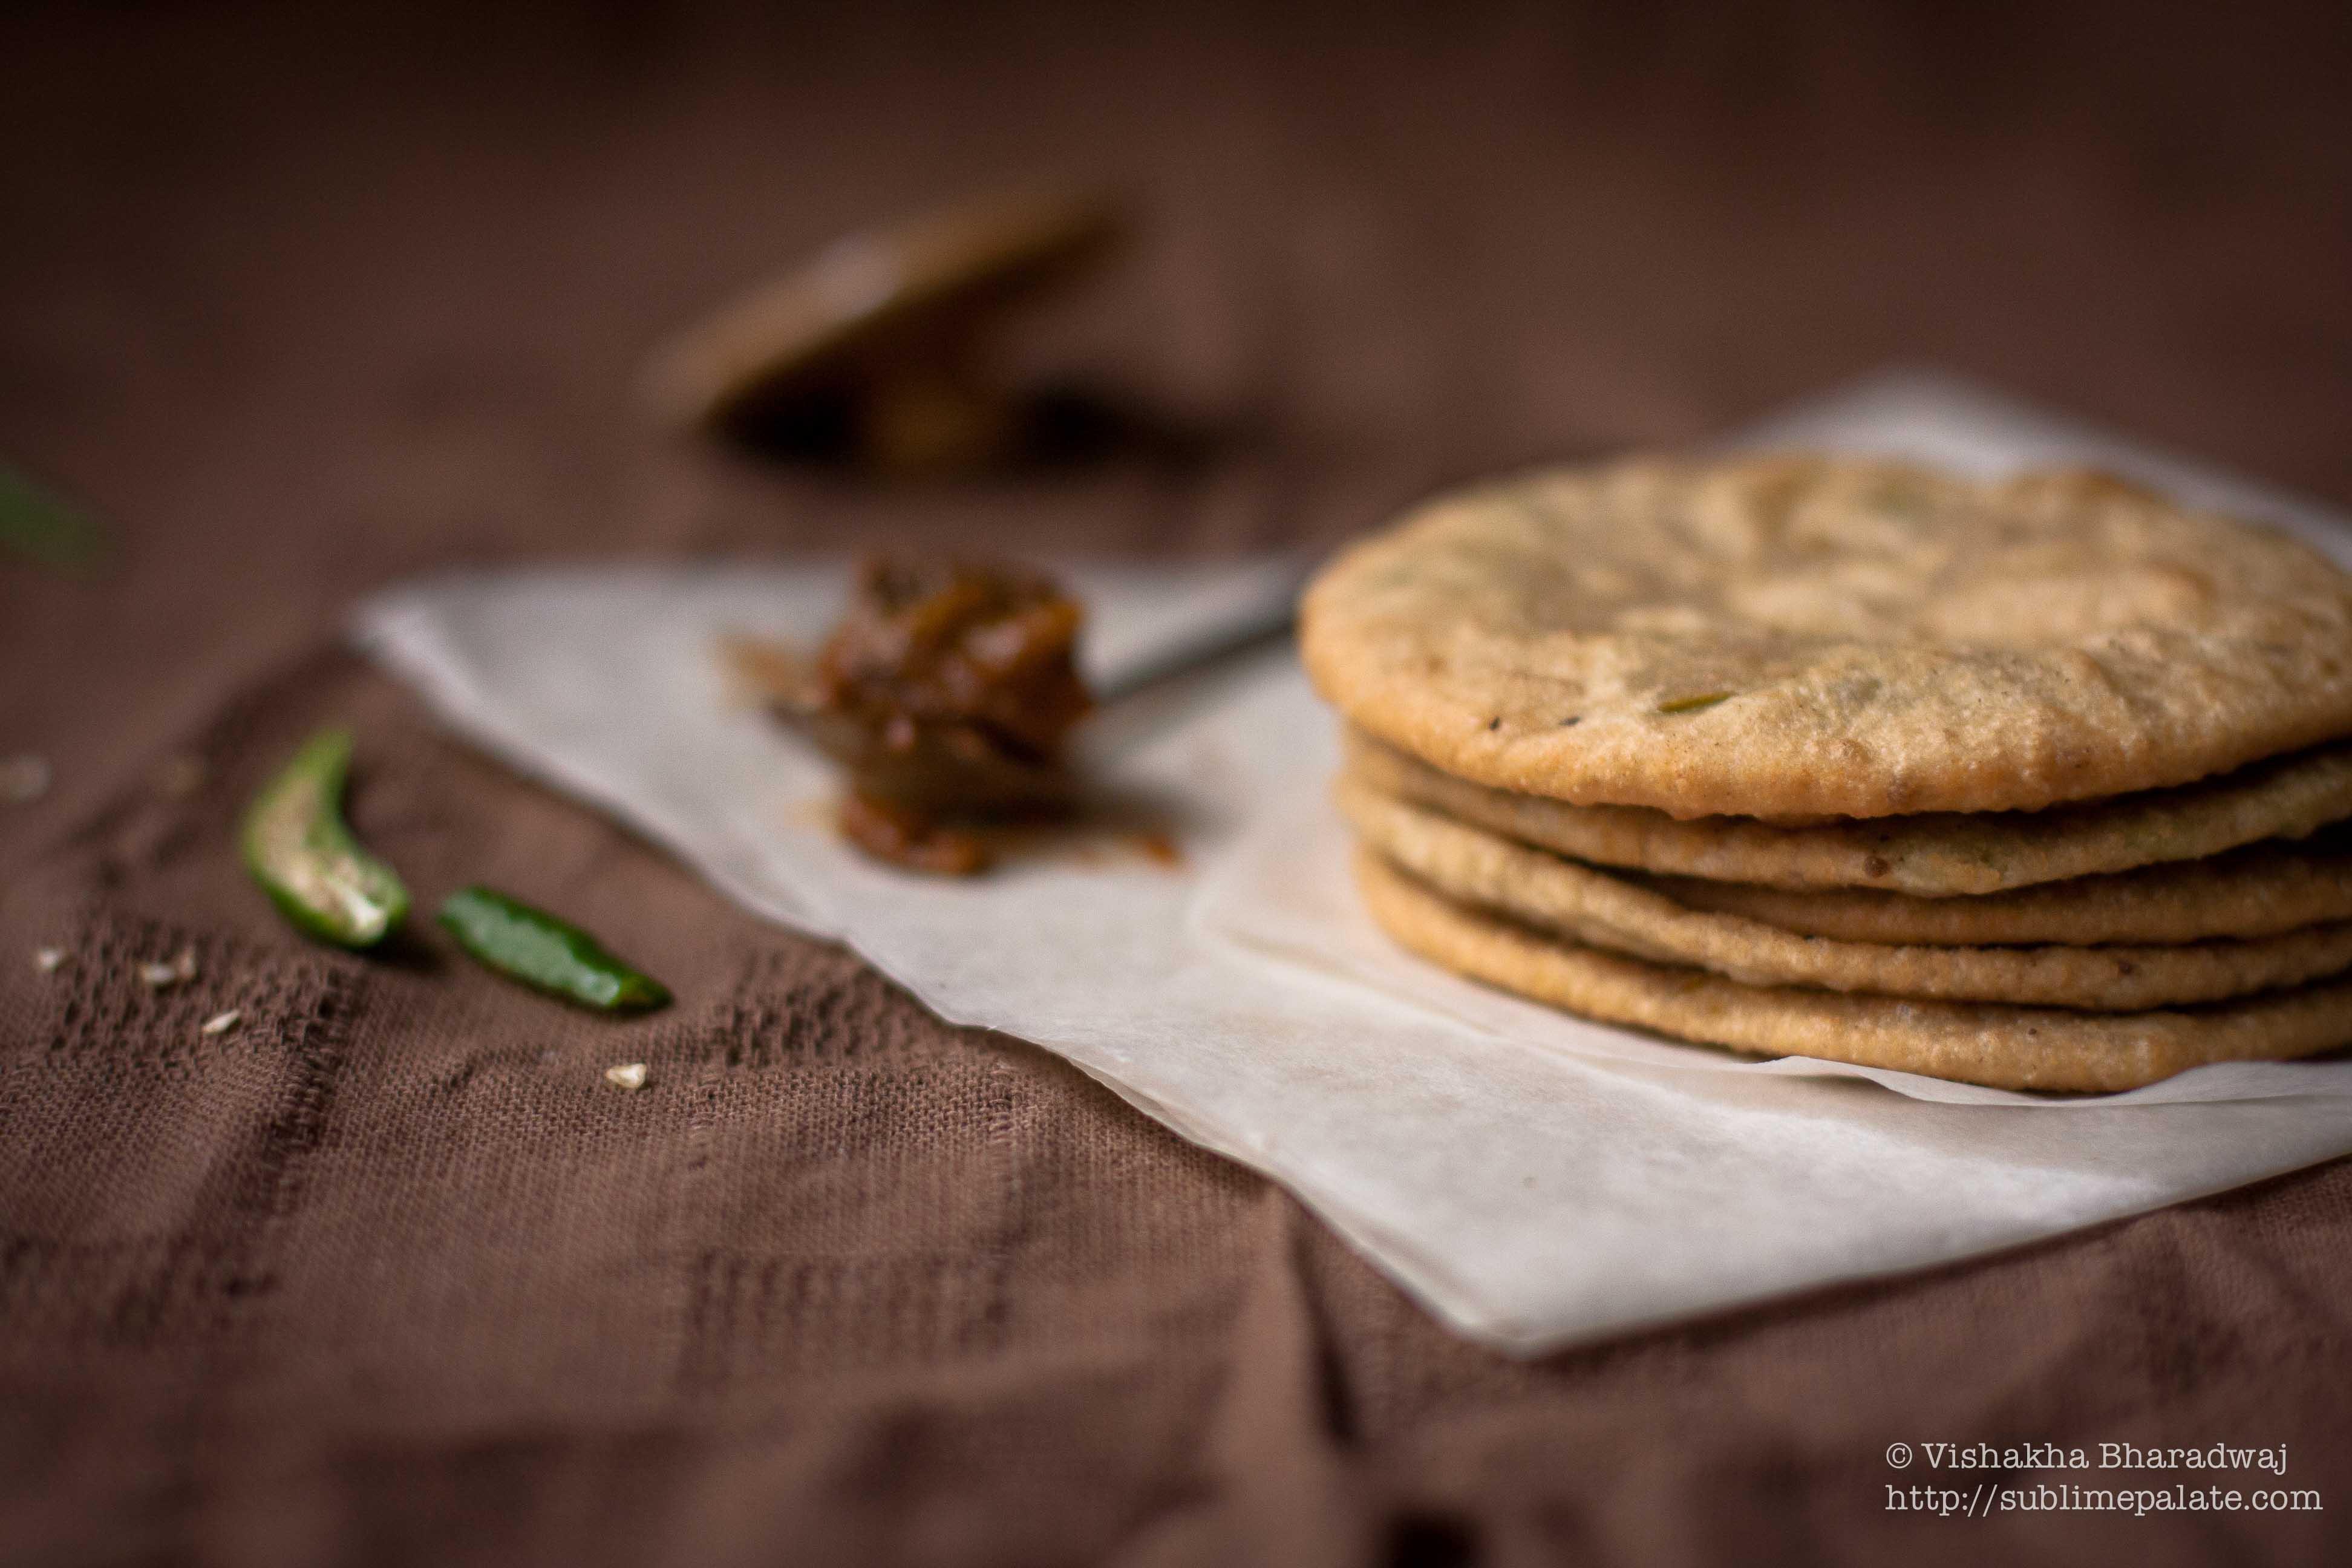 A Bengali Brunch: Koraishootir kochuri [Pooris stuffed with